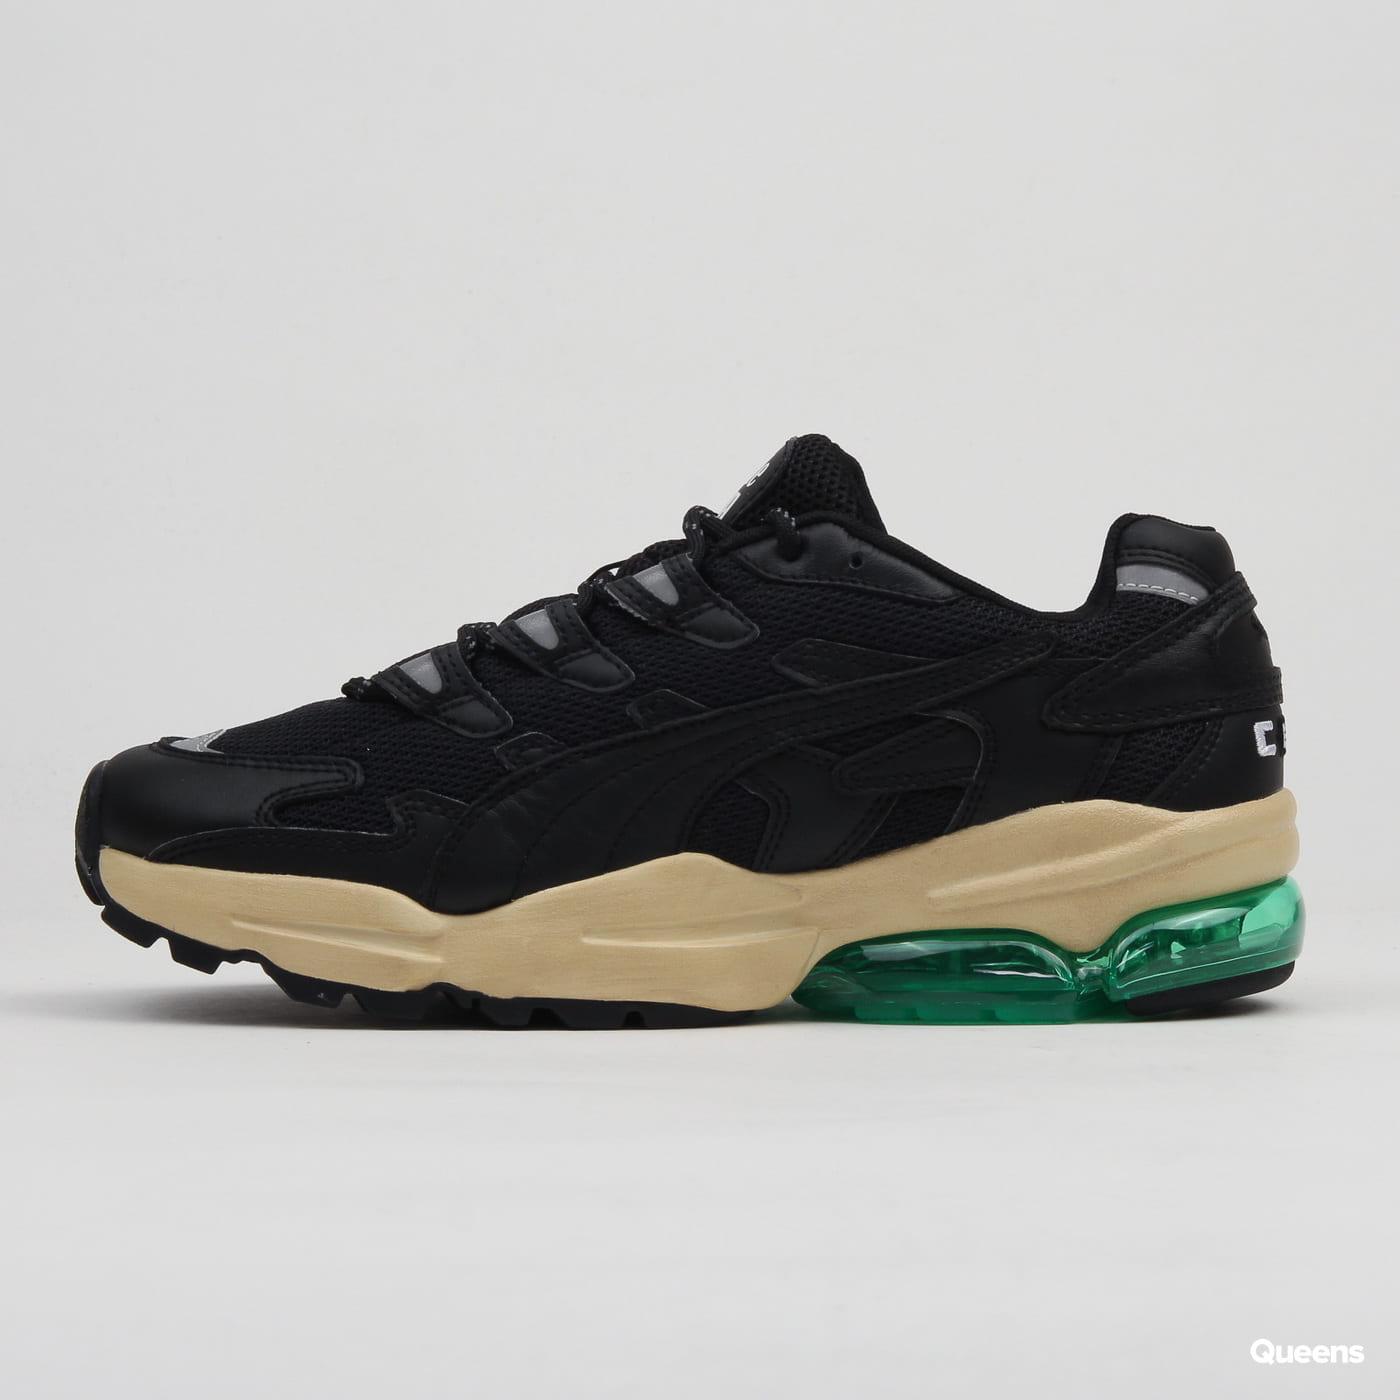 Puma Jungen Schuhe Gr 29 Sneaker in 41462 Neuss für 12,00